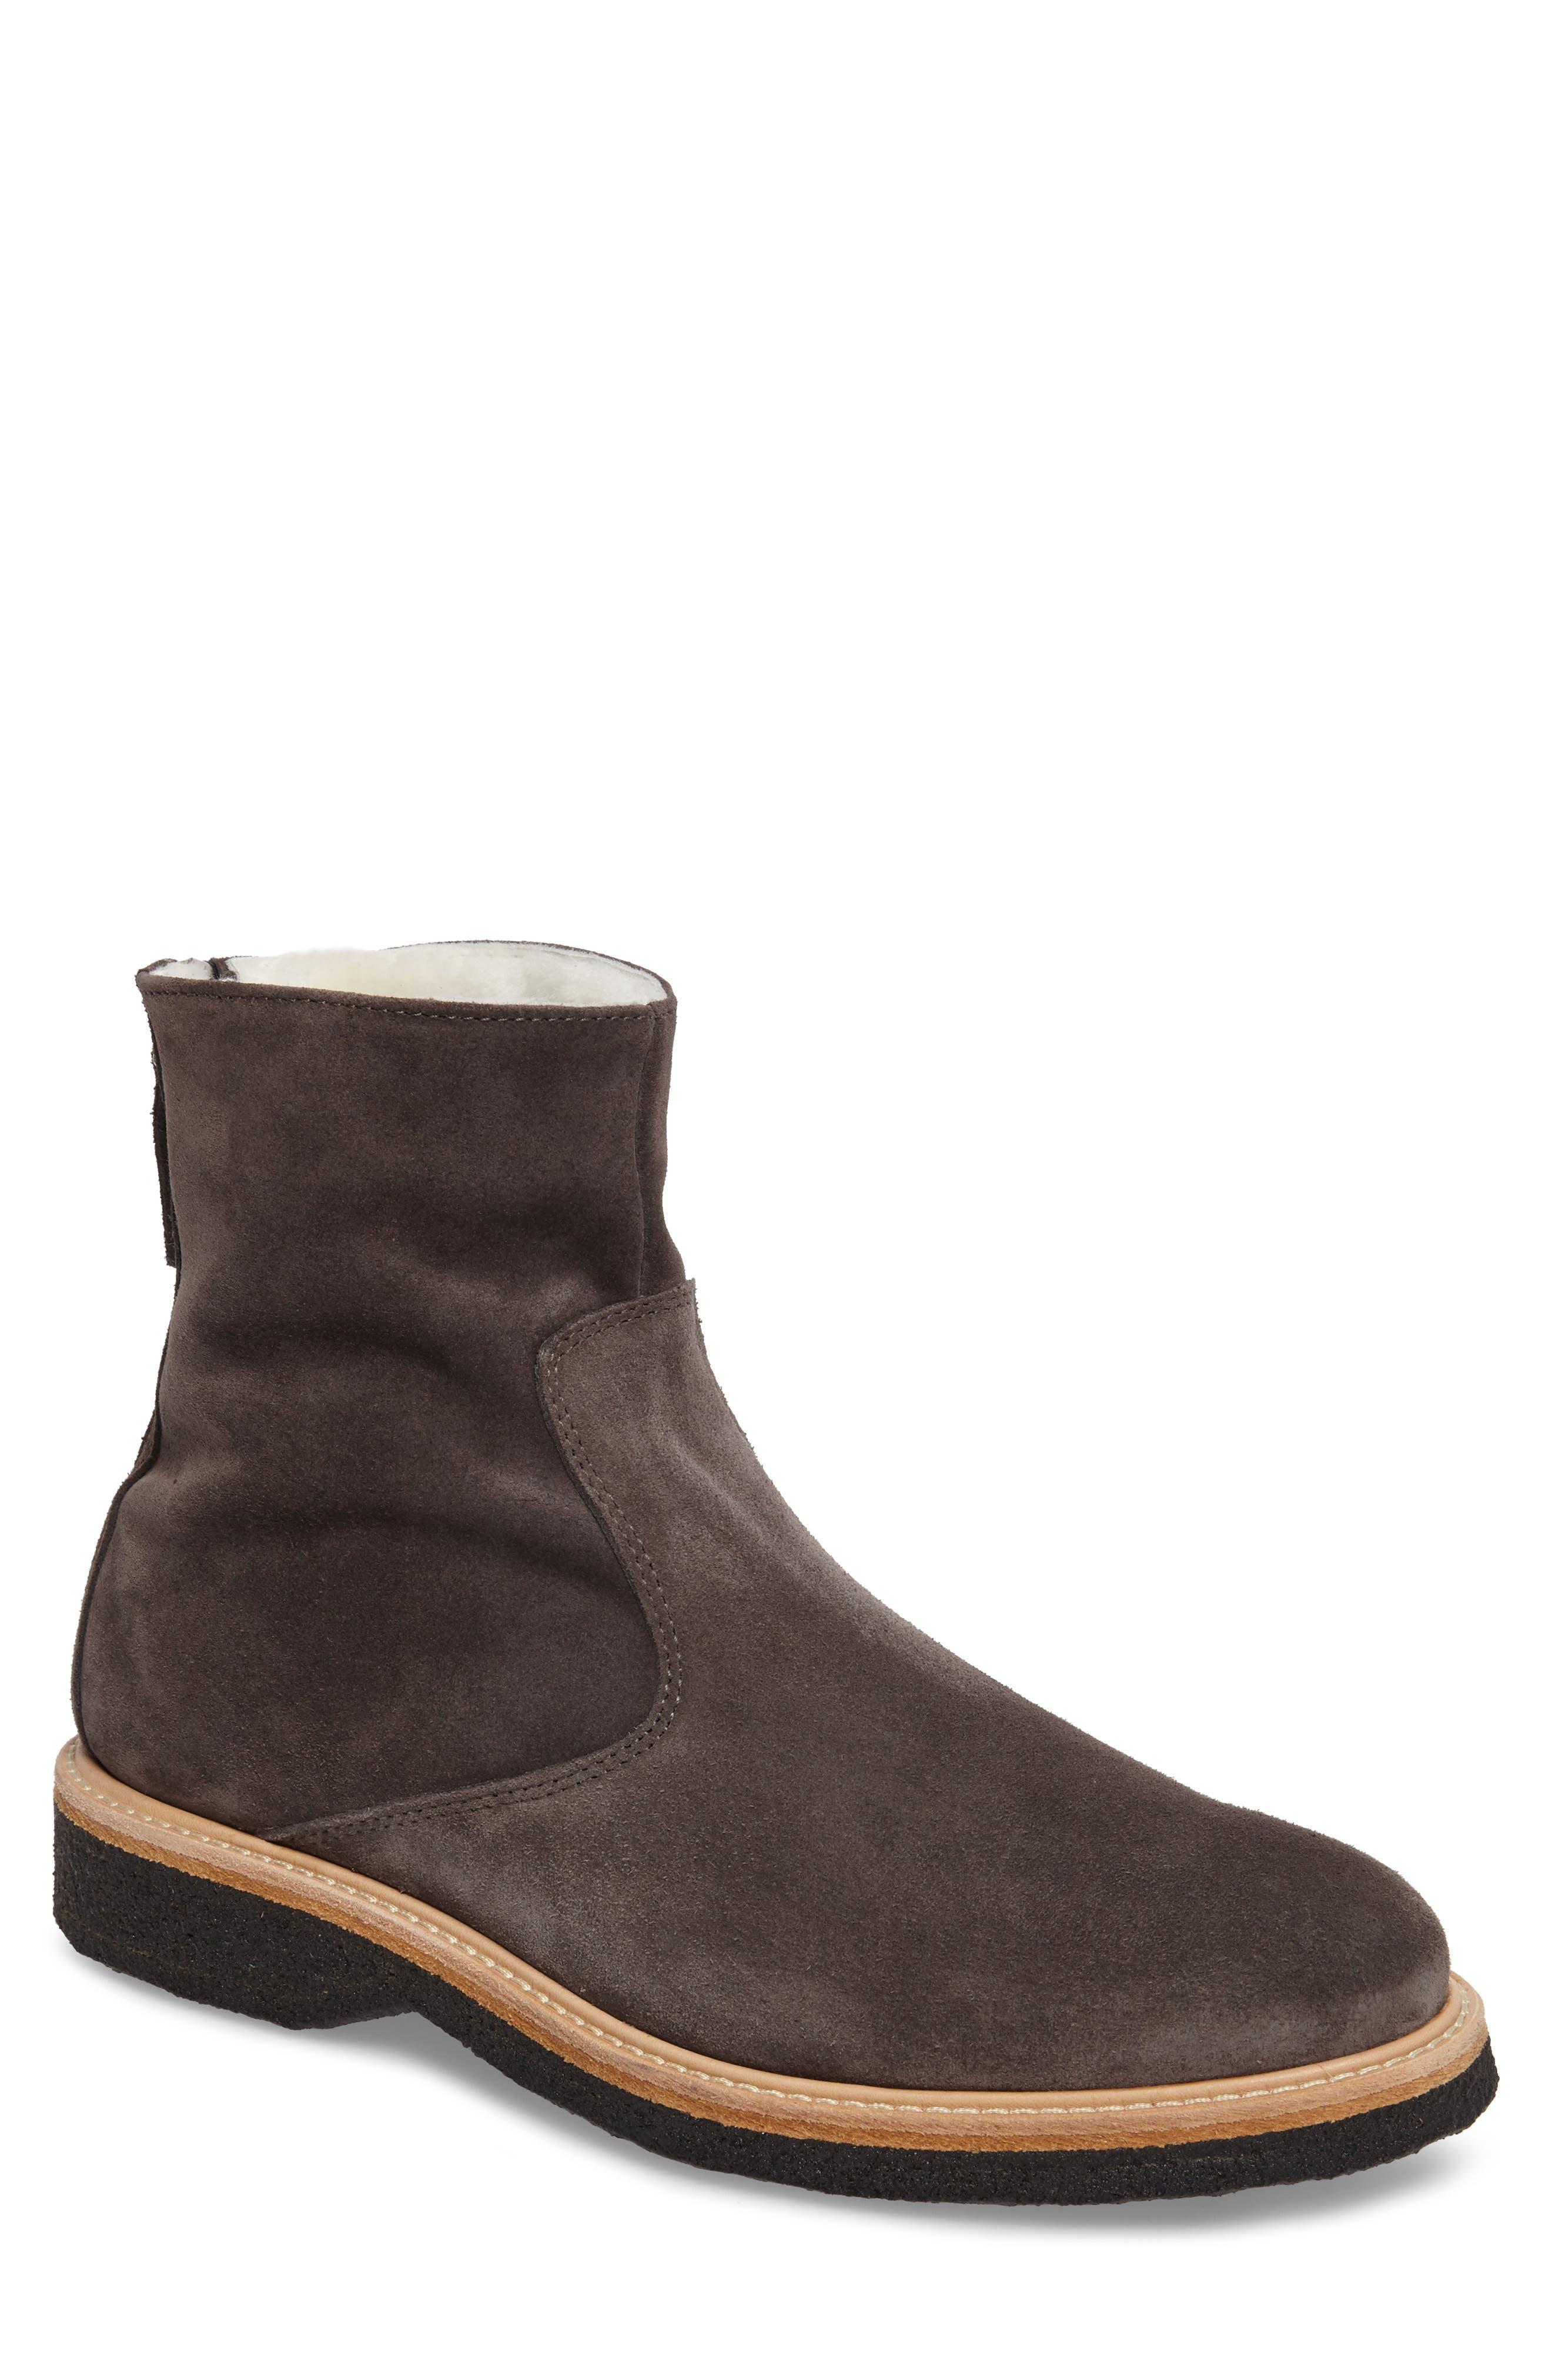 Stevens Zip Boot,                         Main,                         color, 032